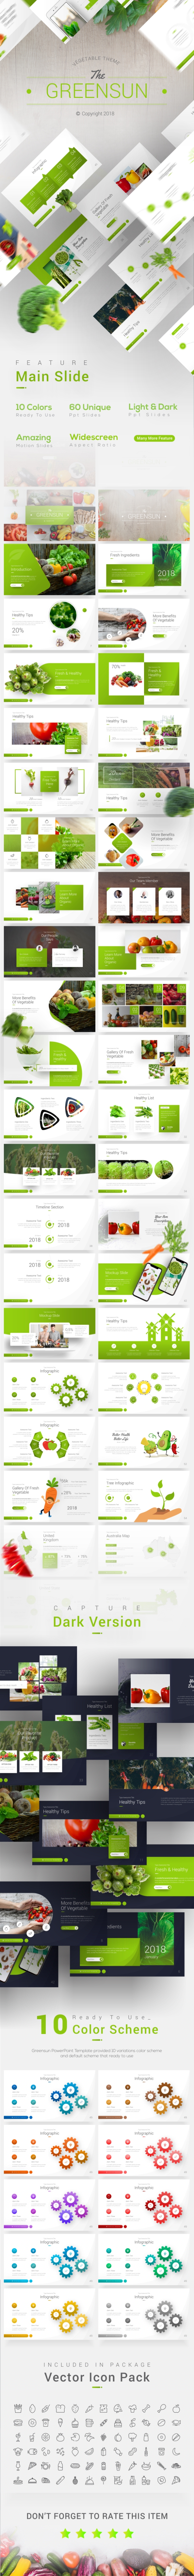 The Greensun Presentation Template - PowerPoint Templates Presentation Templates